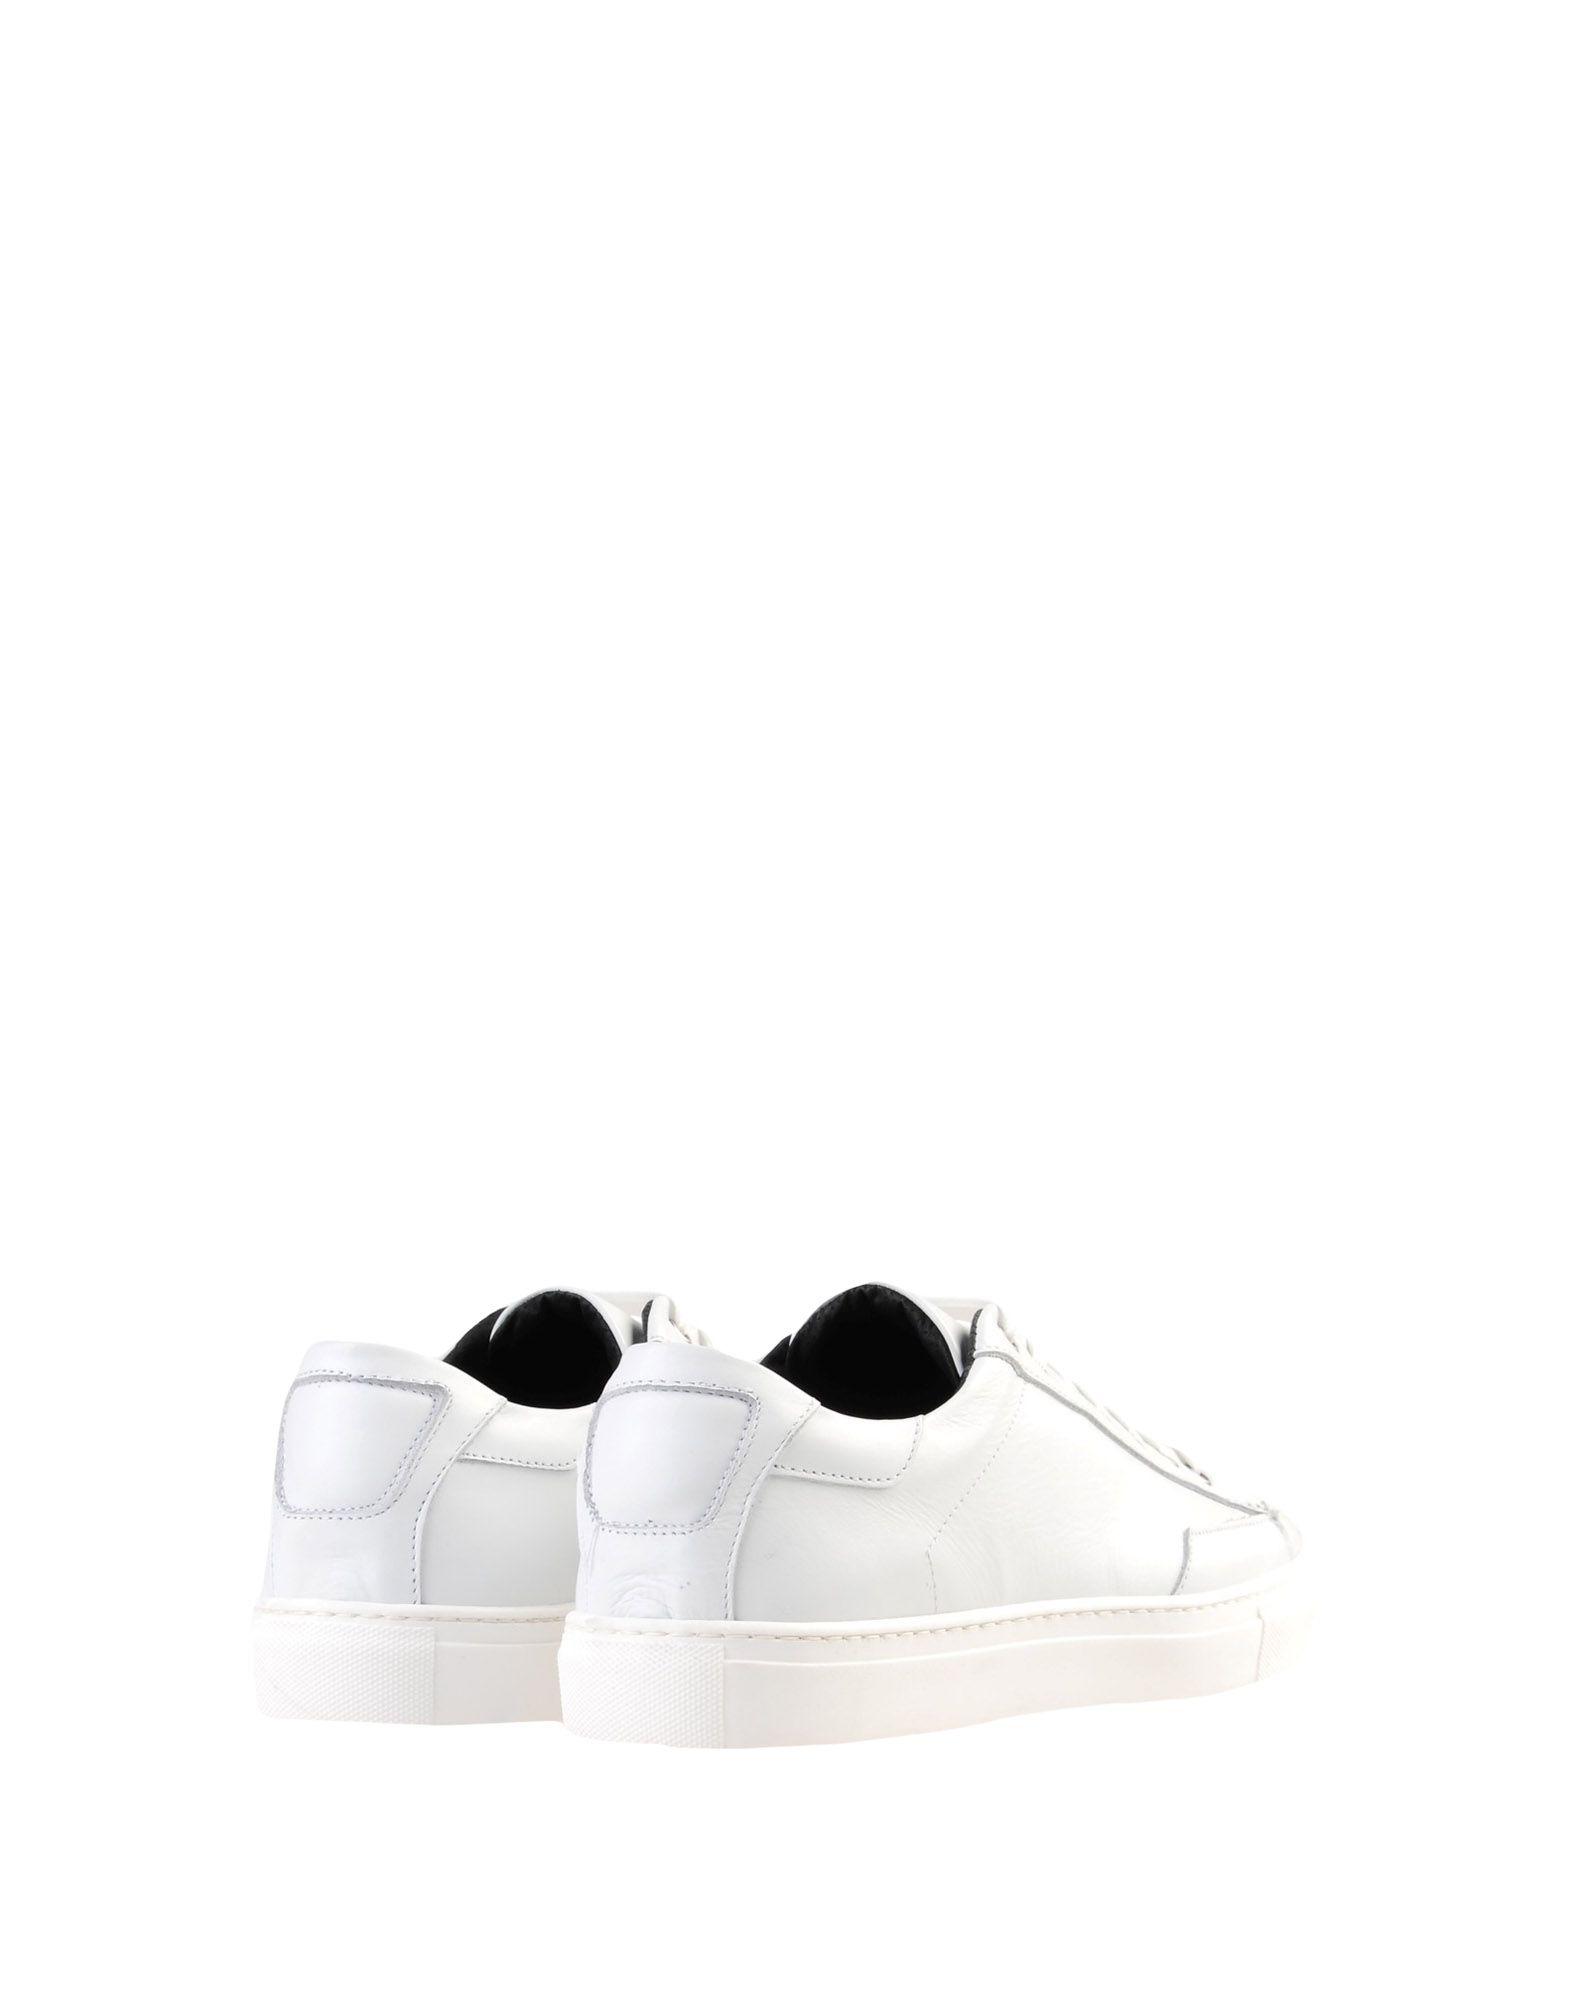 Rabatt echte Schuhe Pierre Darré 11536437KM Sneakers Herren  11536437KM Darré e6ab49